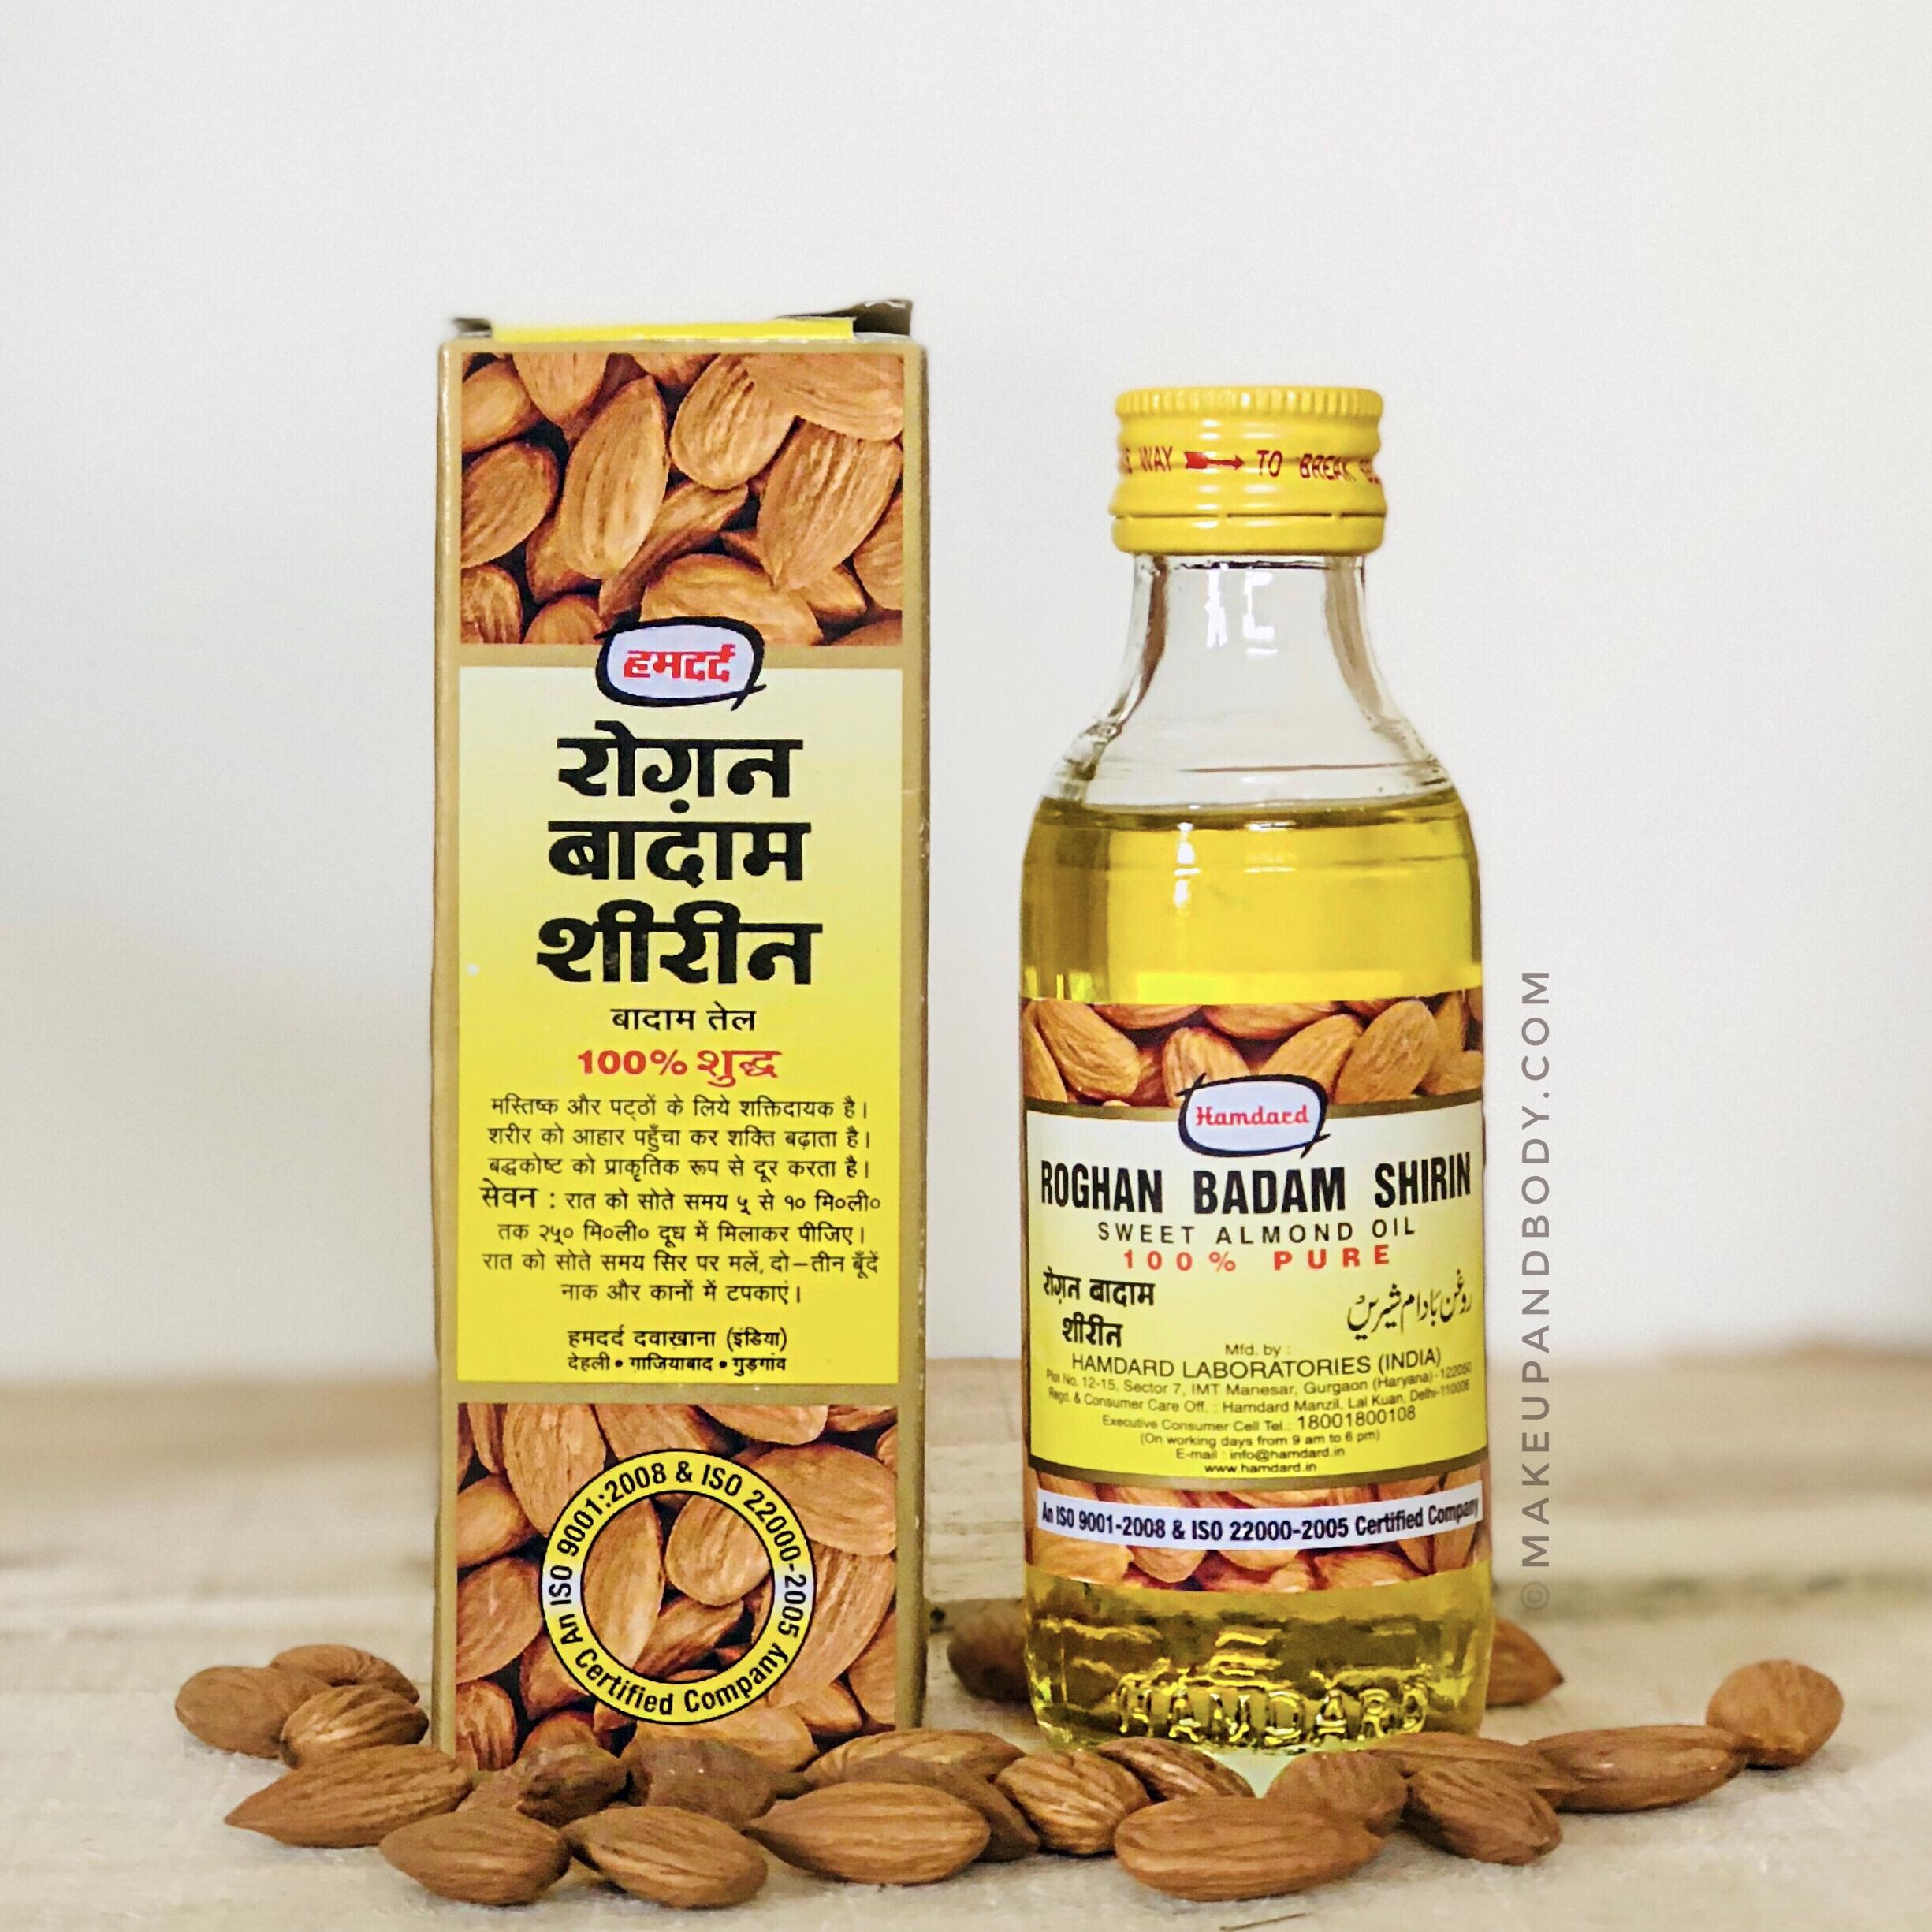 Hamdard Roghan Badam Shirin Sweet Almond Oil - Review, Benefits and Uses